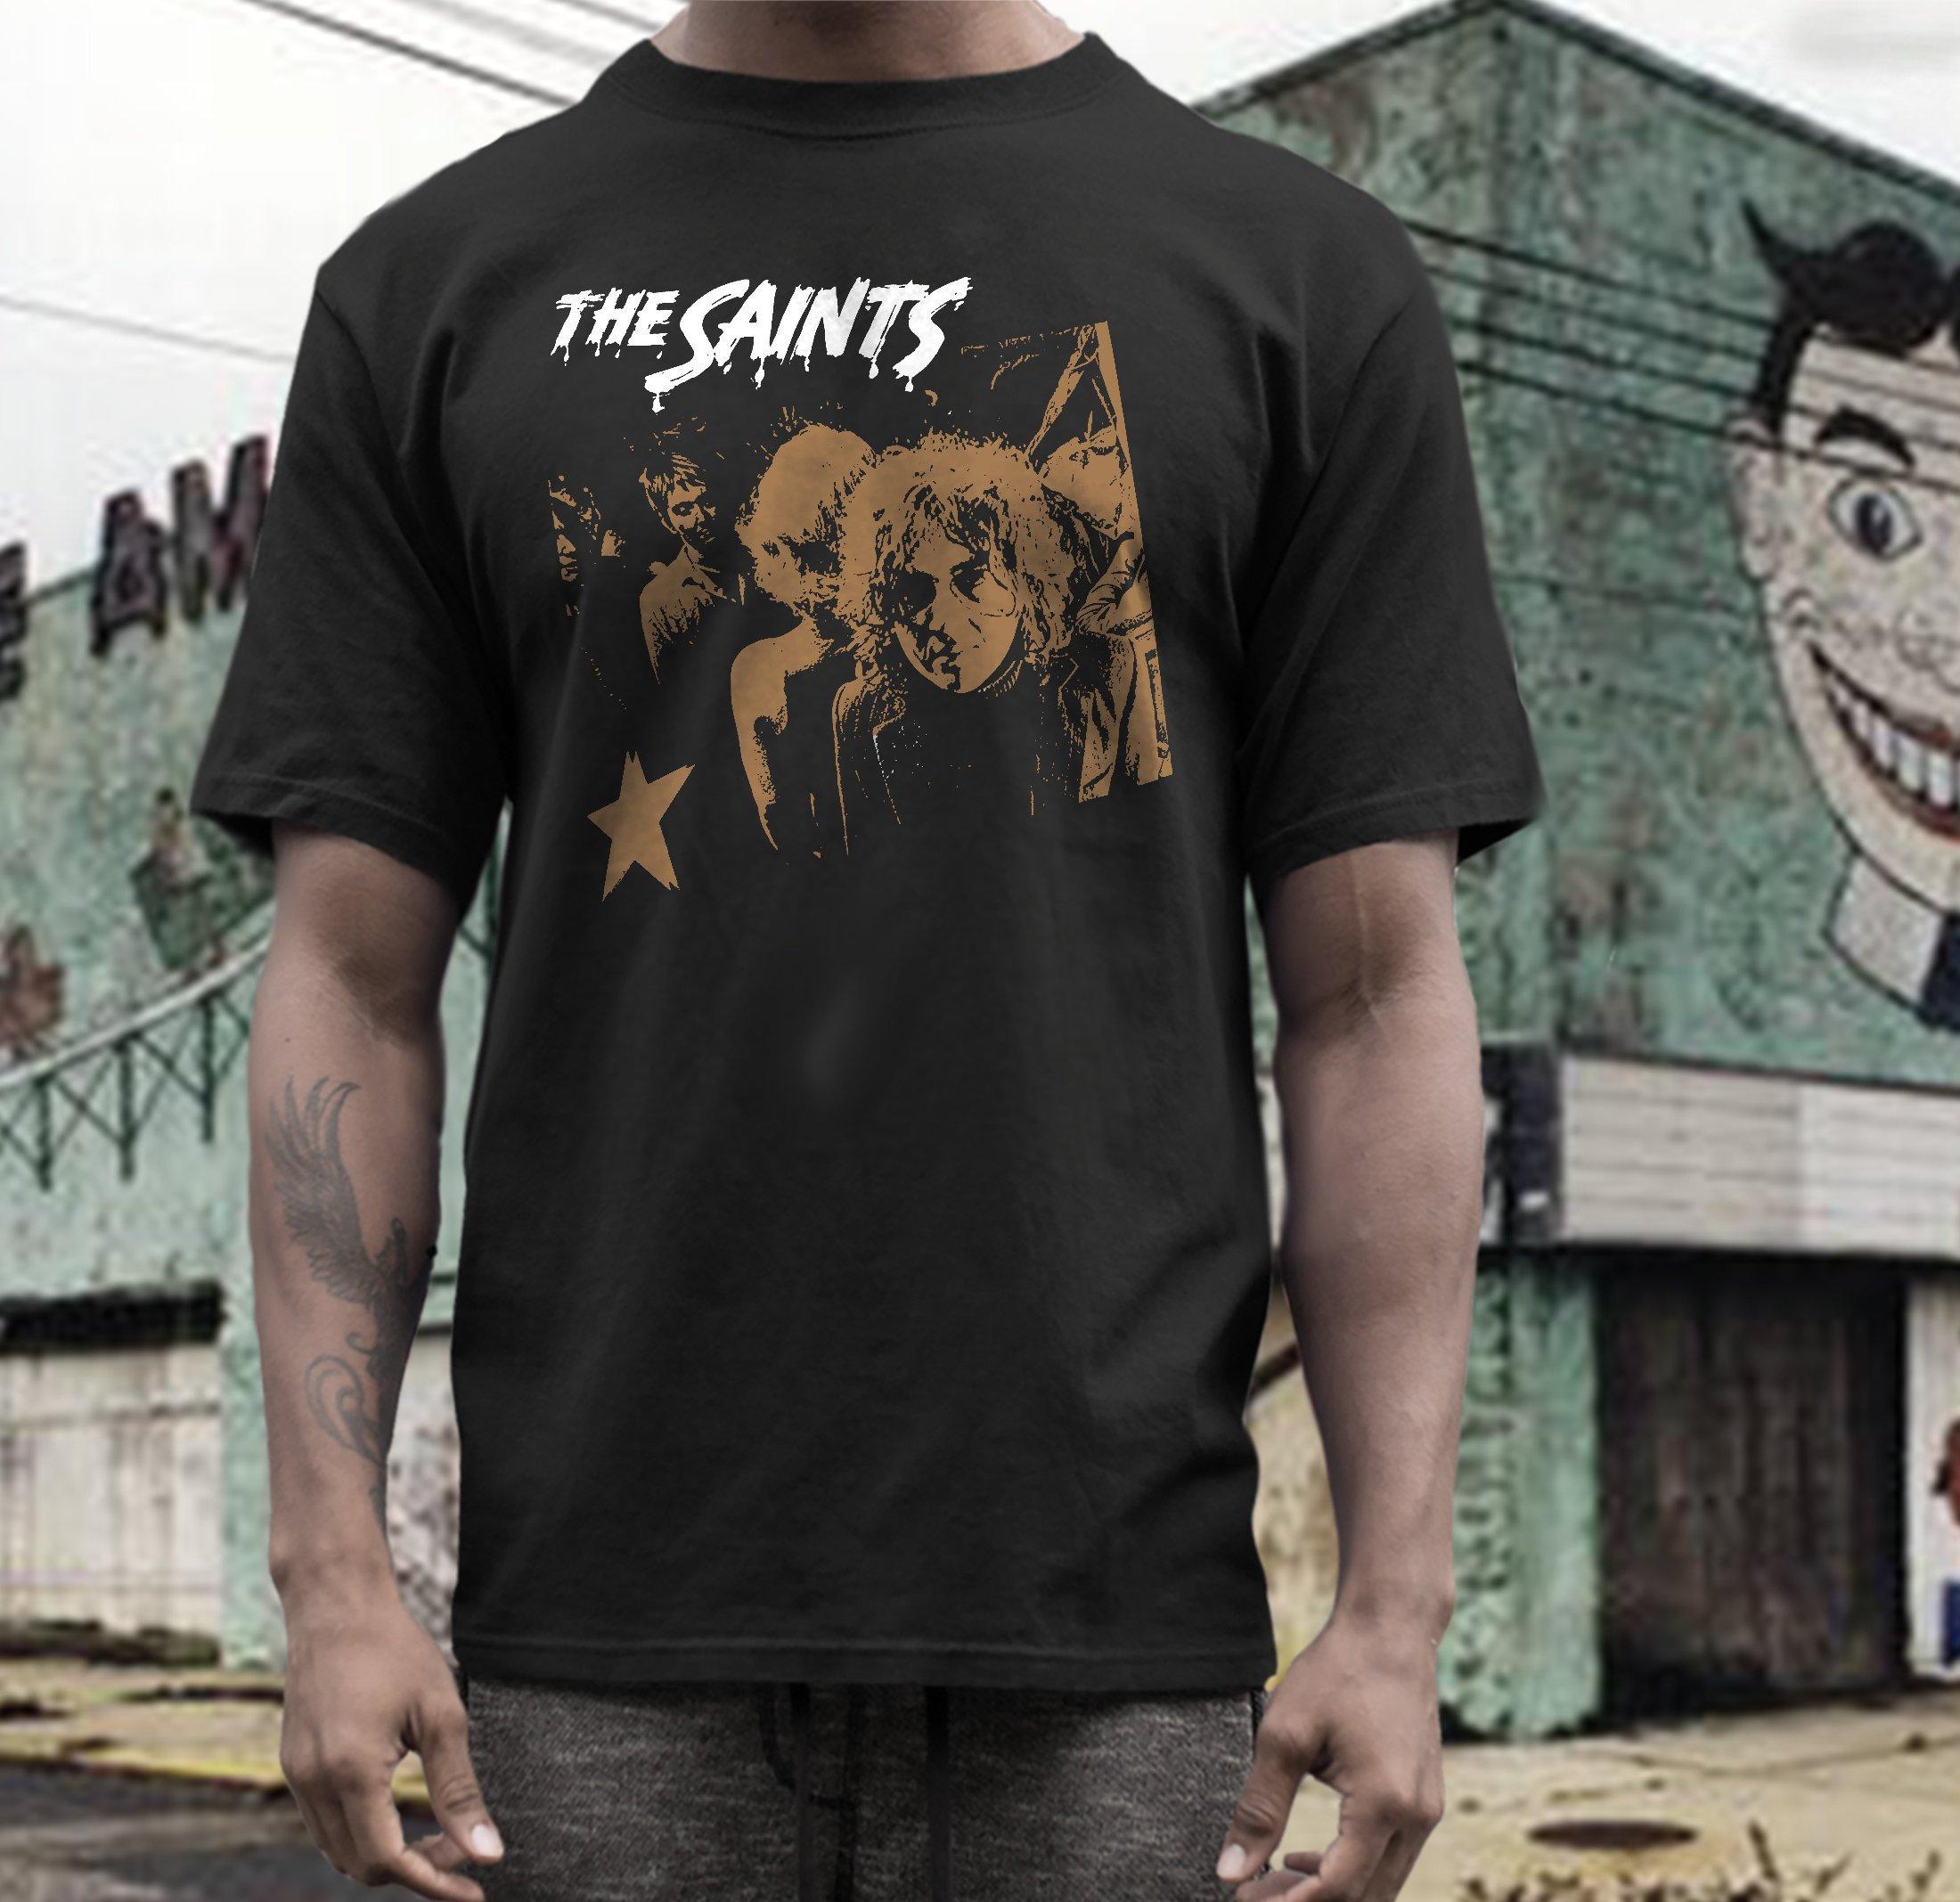 The Saints T Shirt Screen Print Short Sleeve Shirt Cotton Etsy